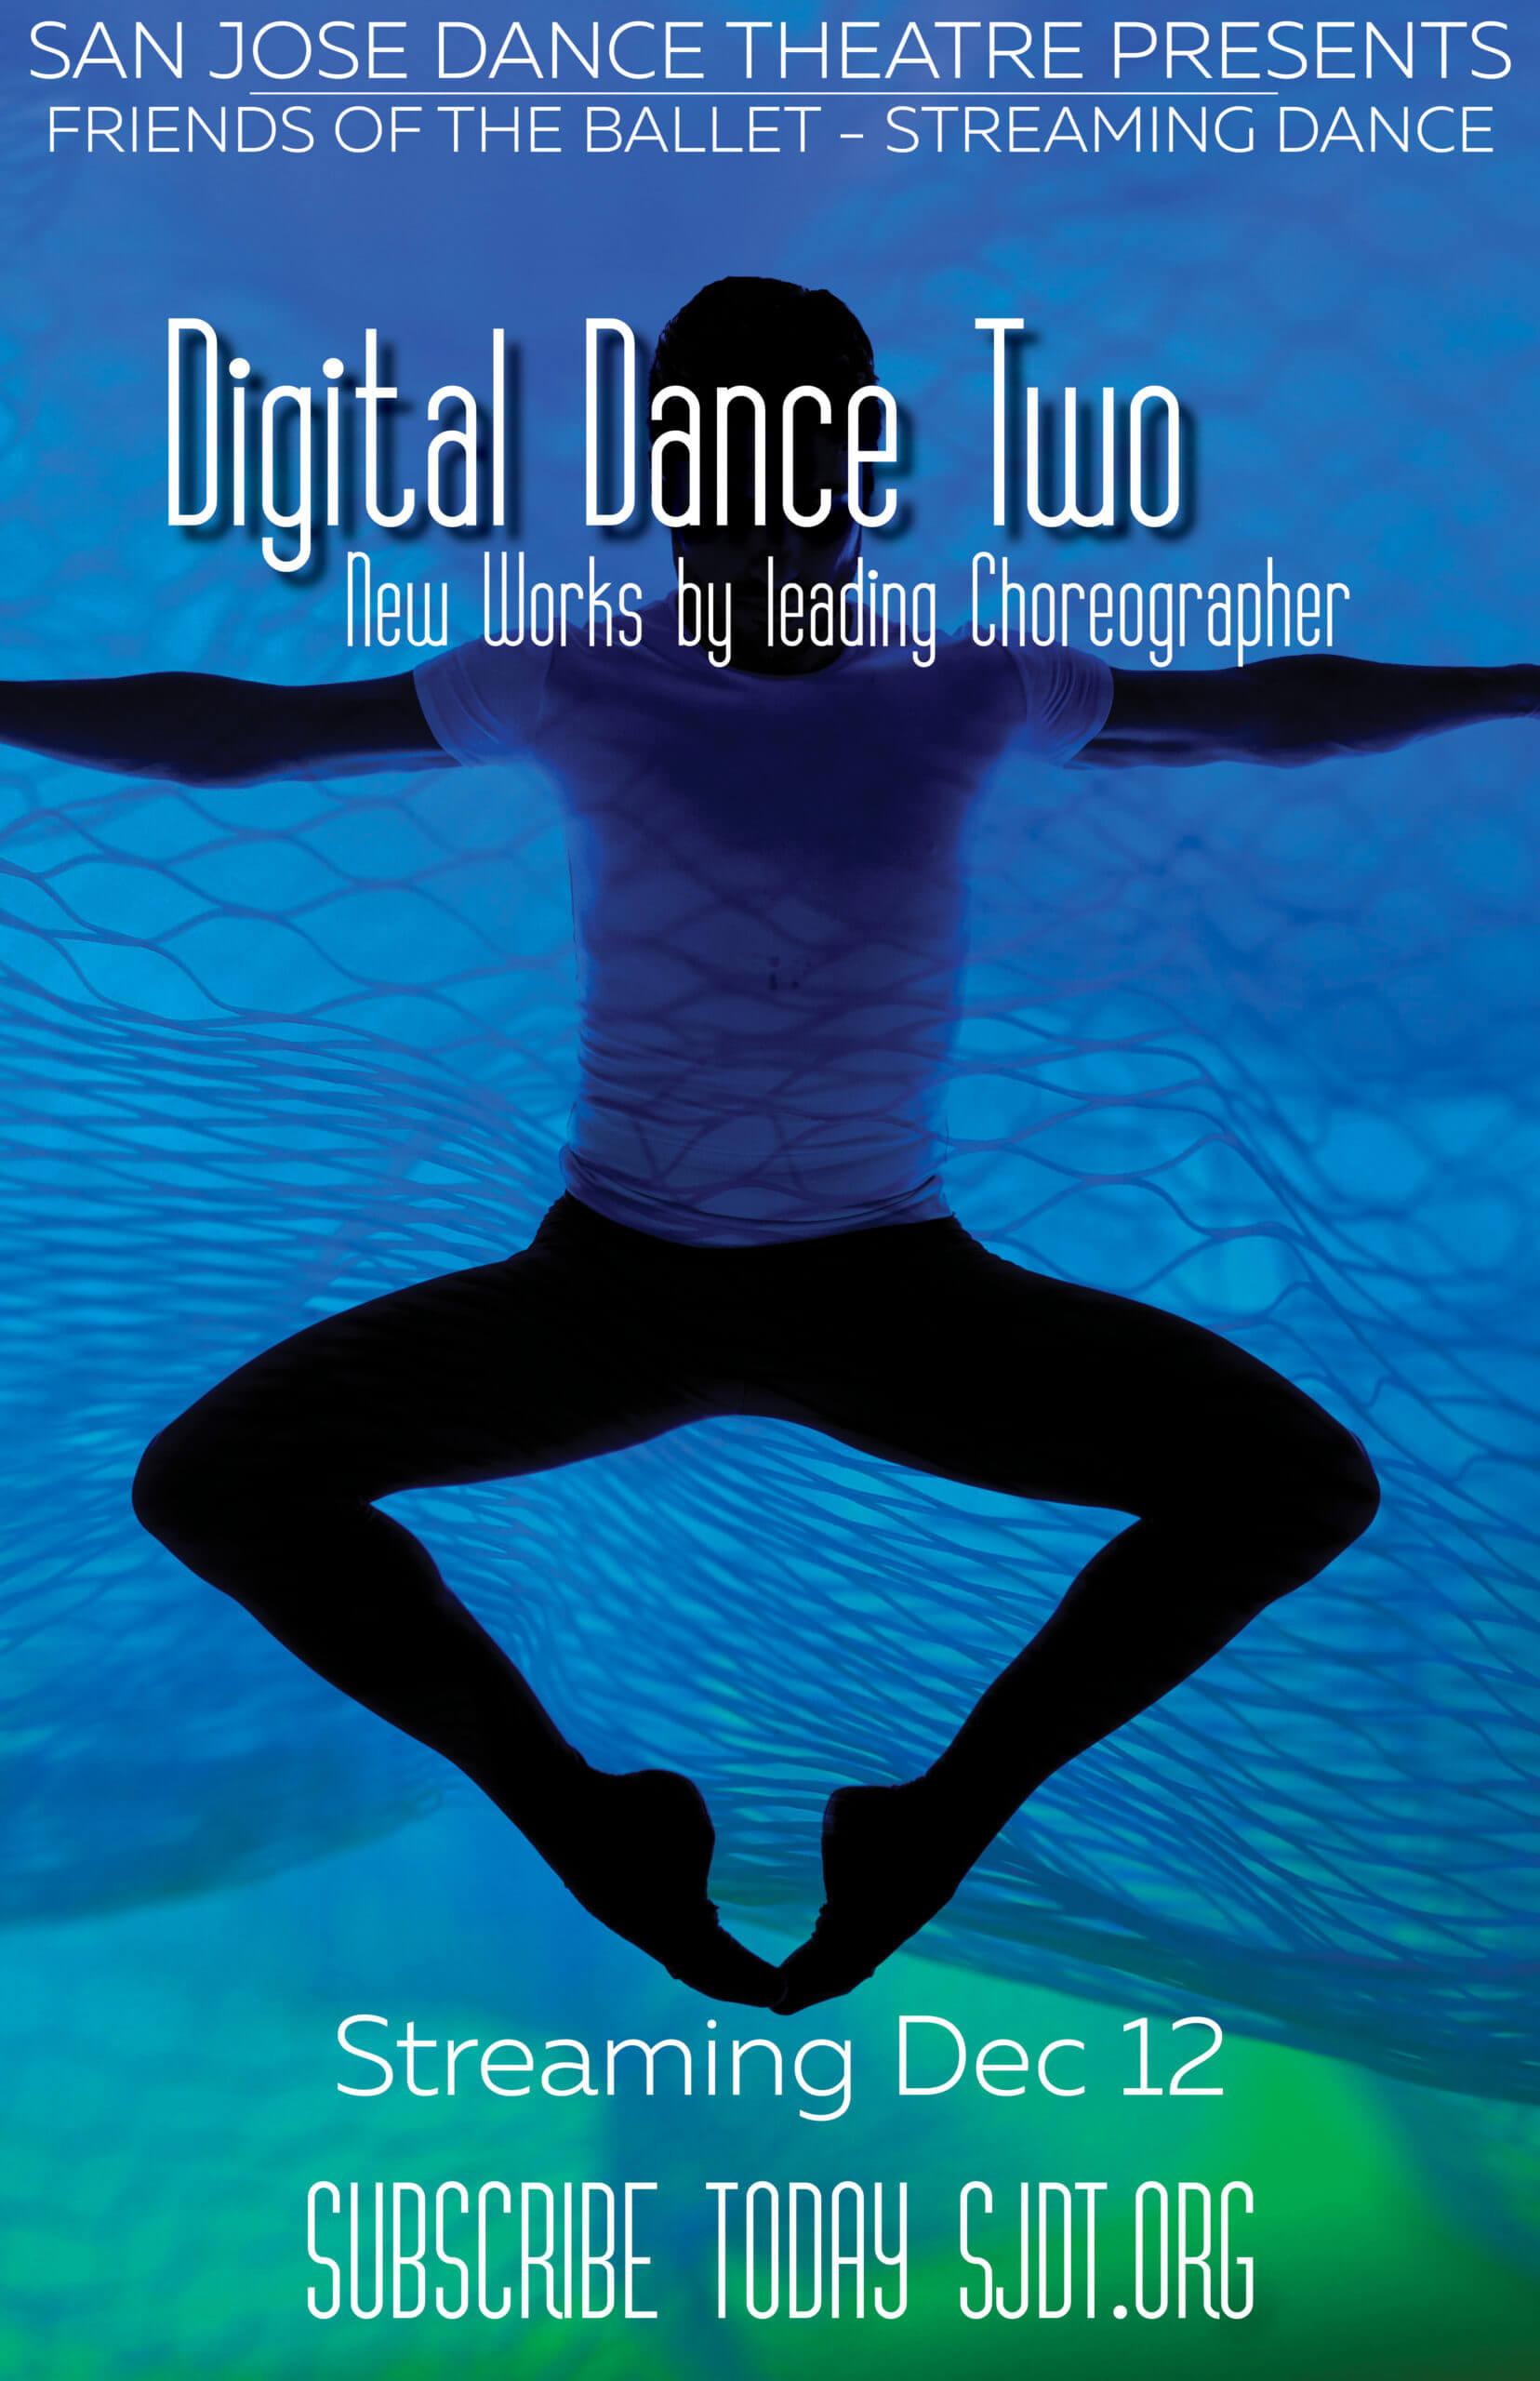 Digital Dance 2